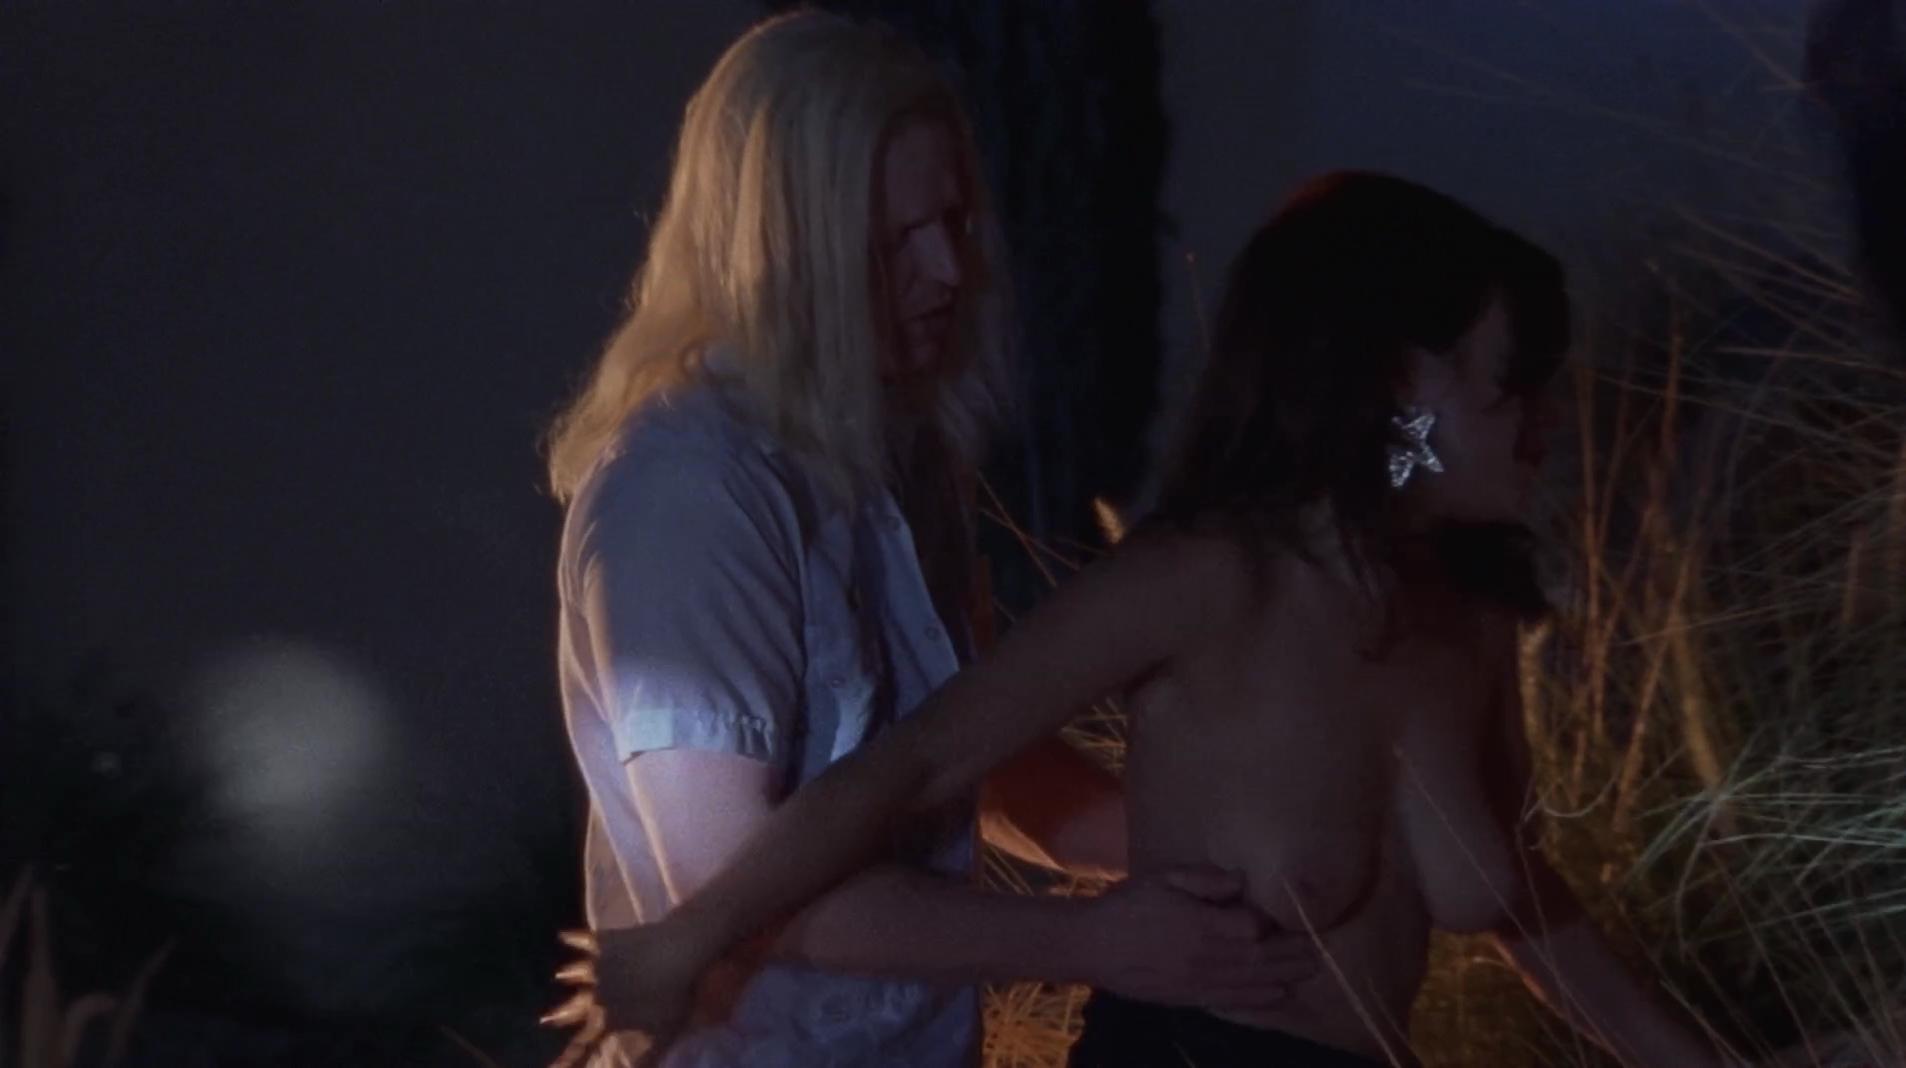 necked girl videos in myanmar